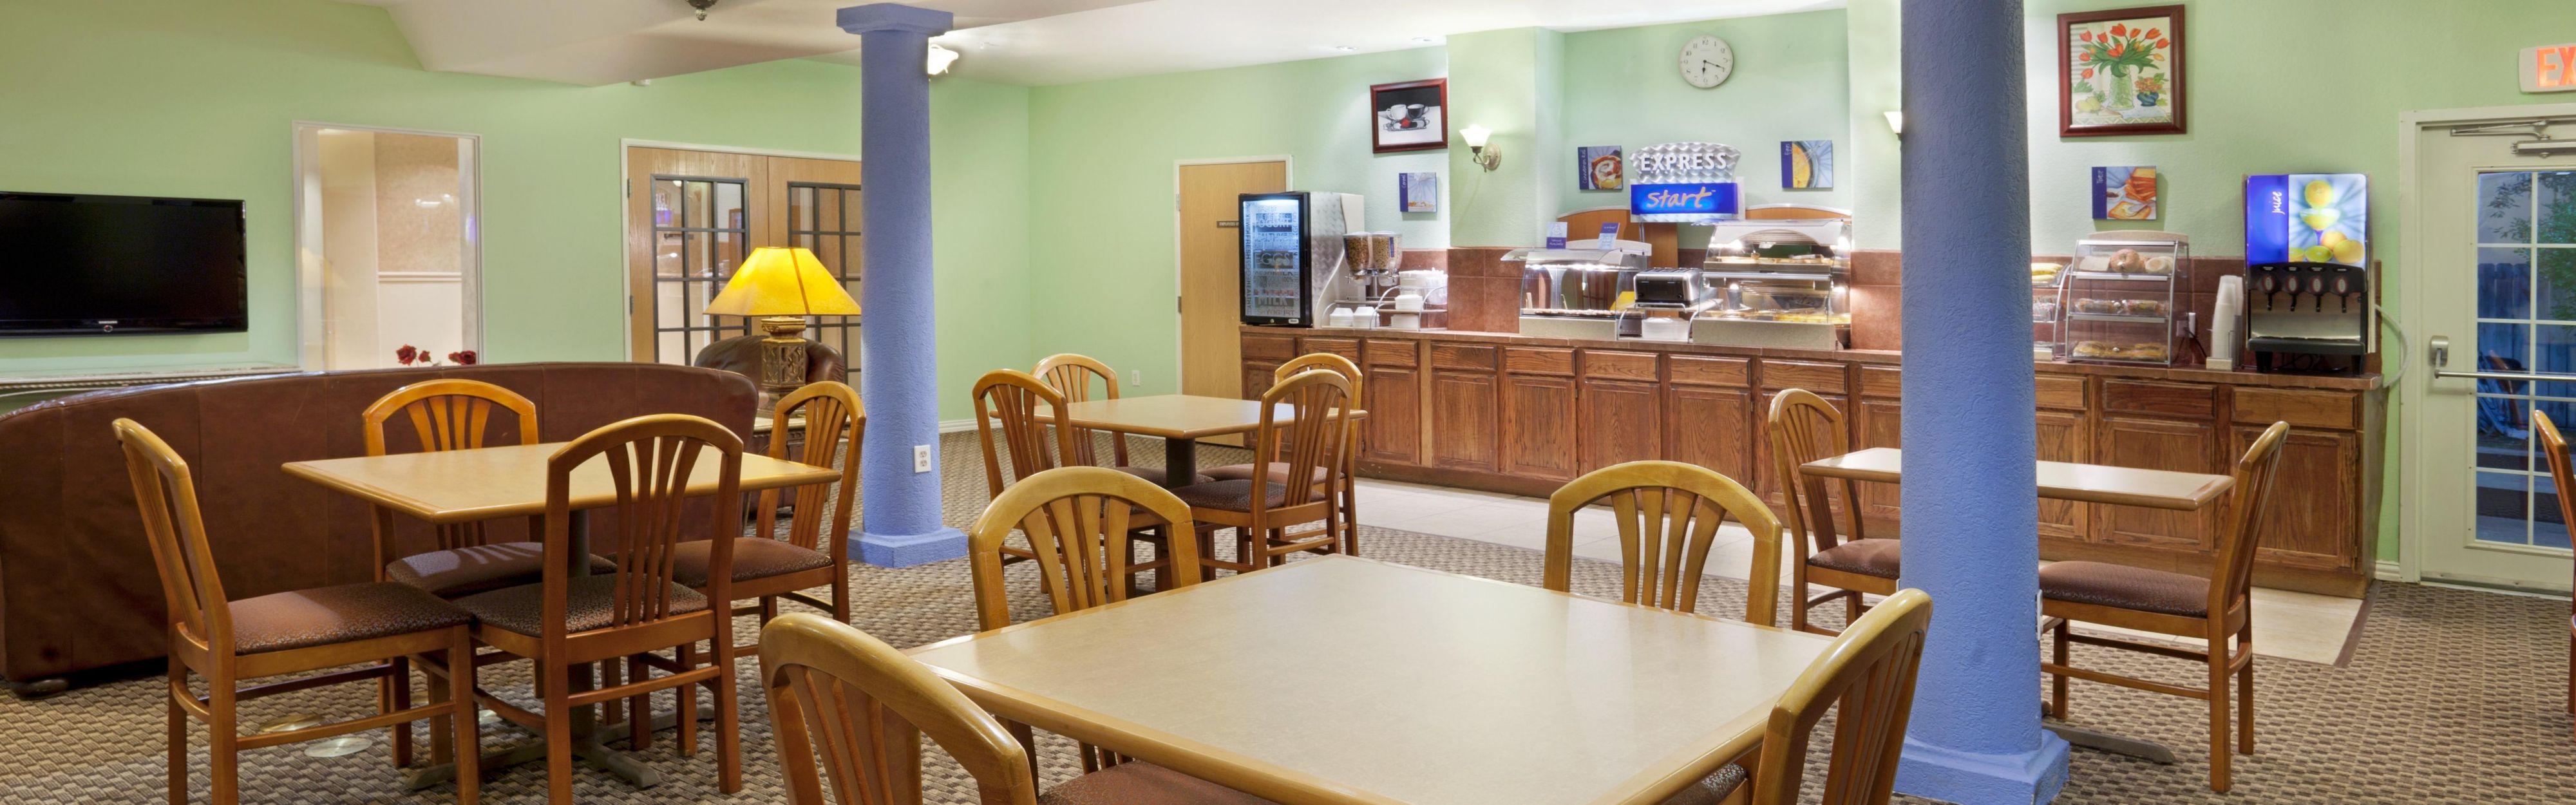 Holiday Inn Express & Suites Elgin image 3